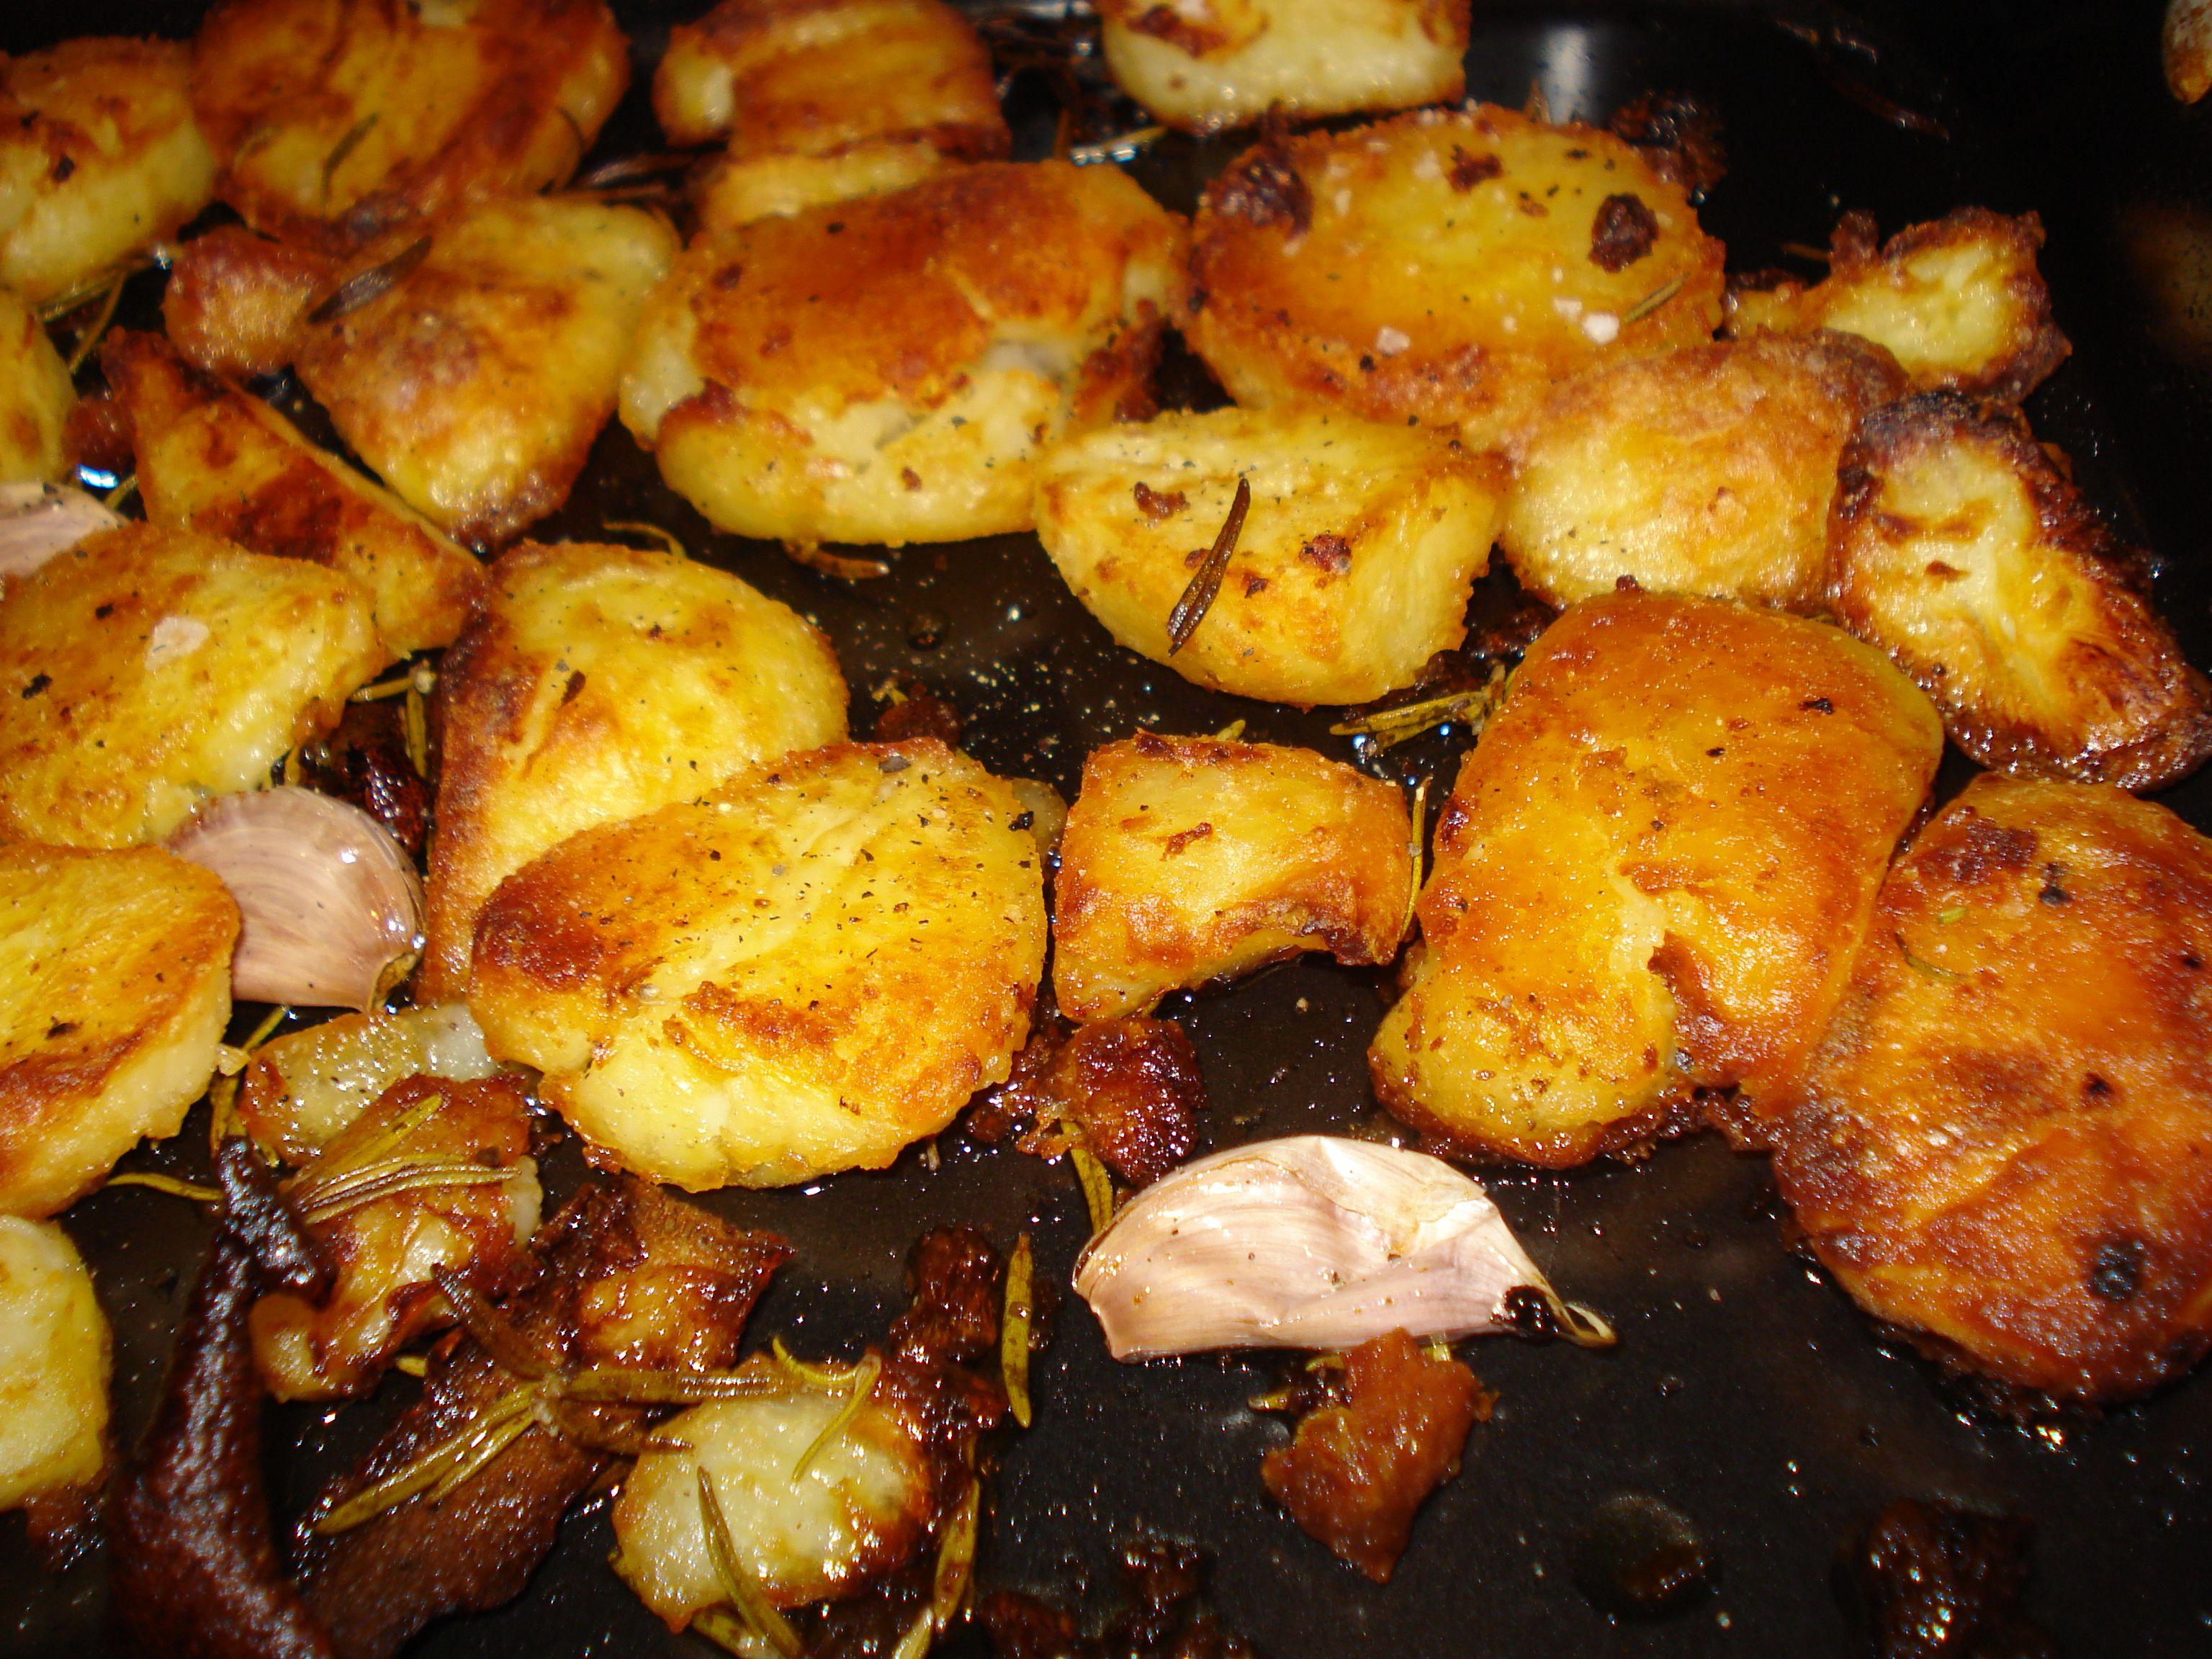 Rosemary and garlic potatoes jamie oliver